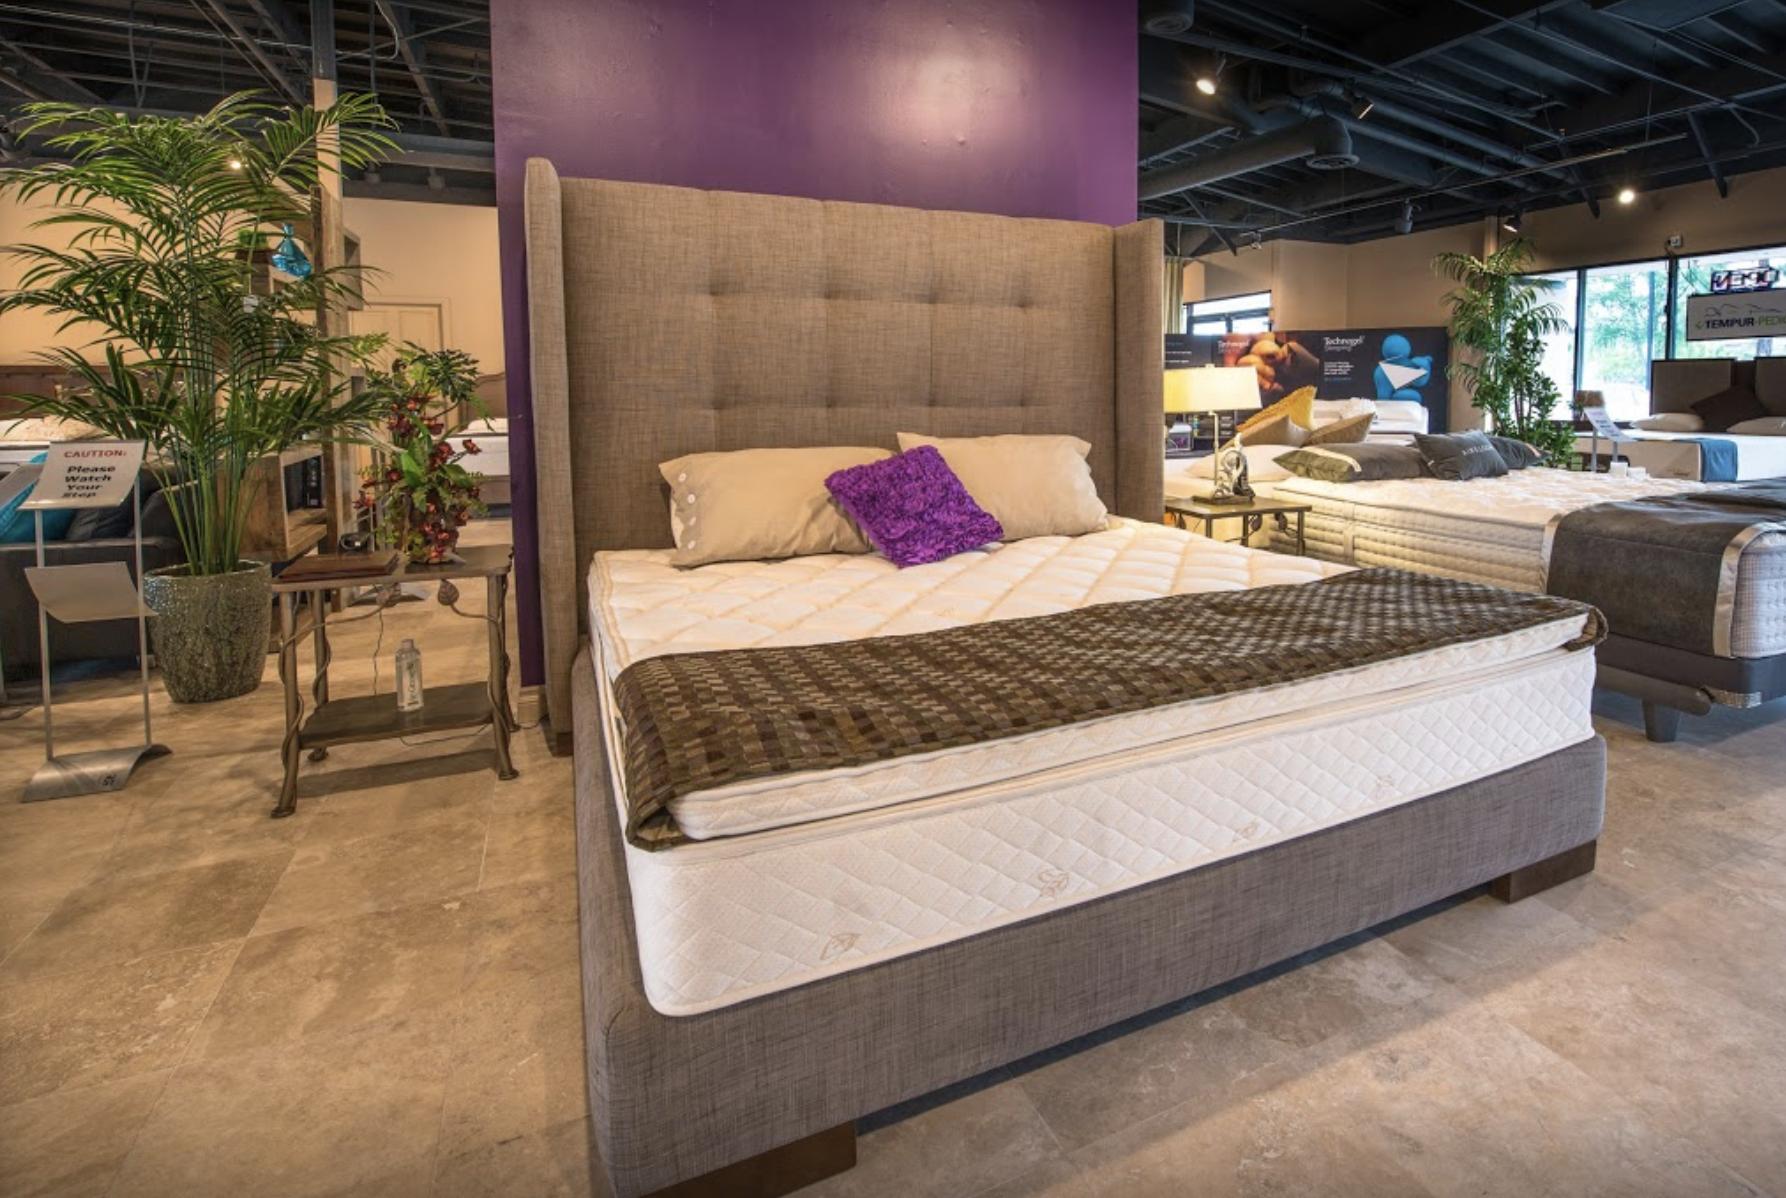 Ergo Beds – Natural Vita Talalay Latex Mattress Store In Las Vegas Nevada